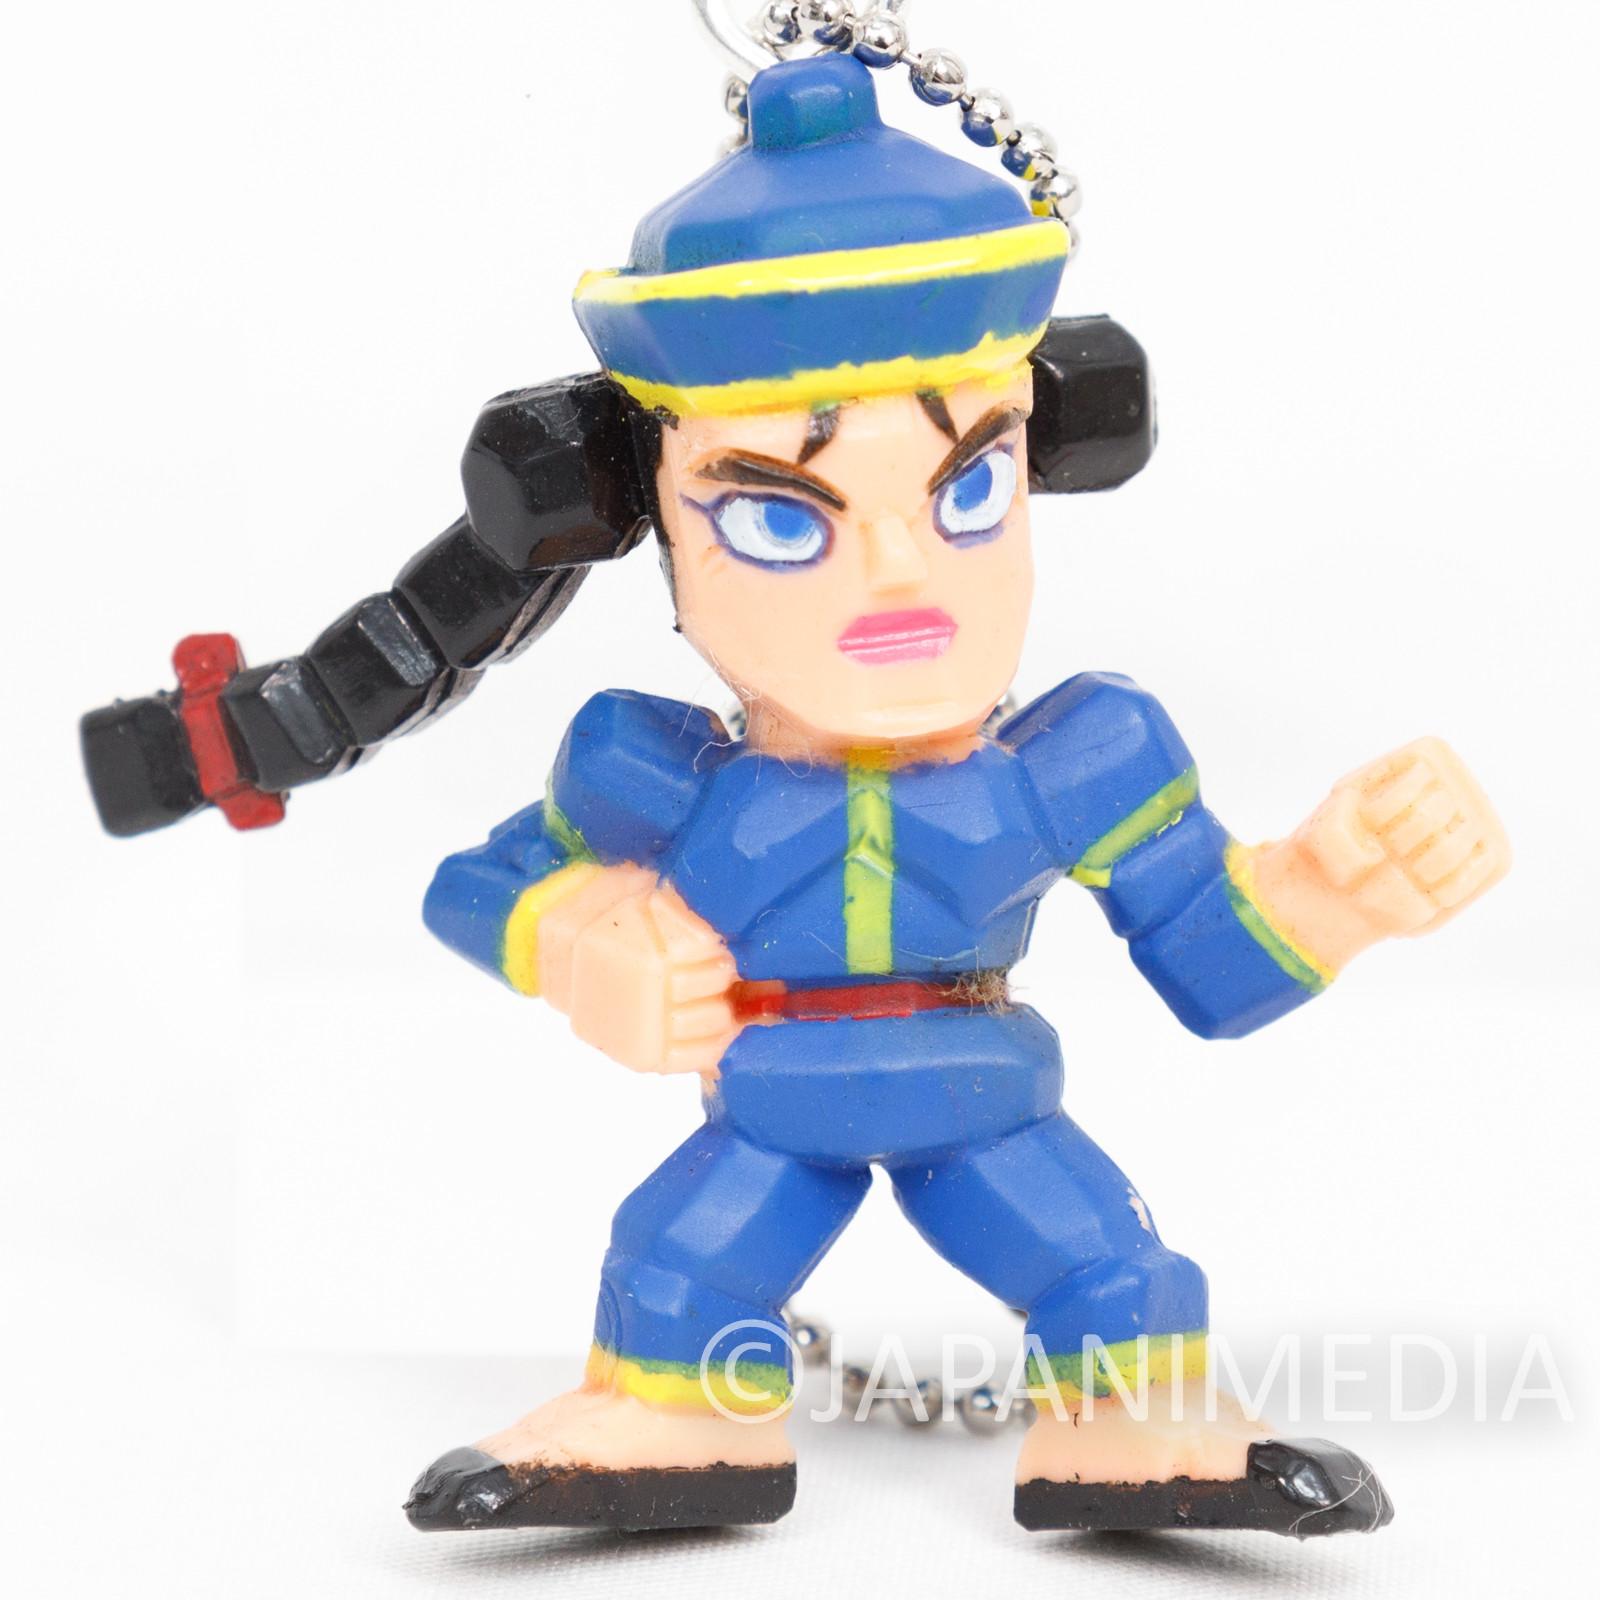 Virtua Fighter Pai Chan Mini Figure Ballchain JAPAN GAME